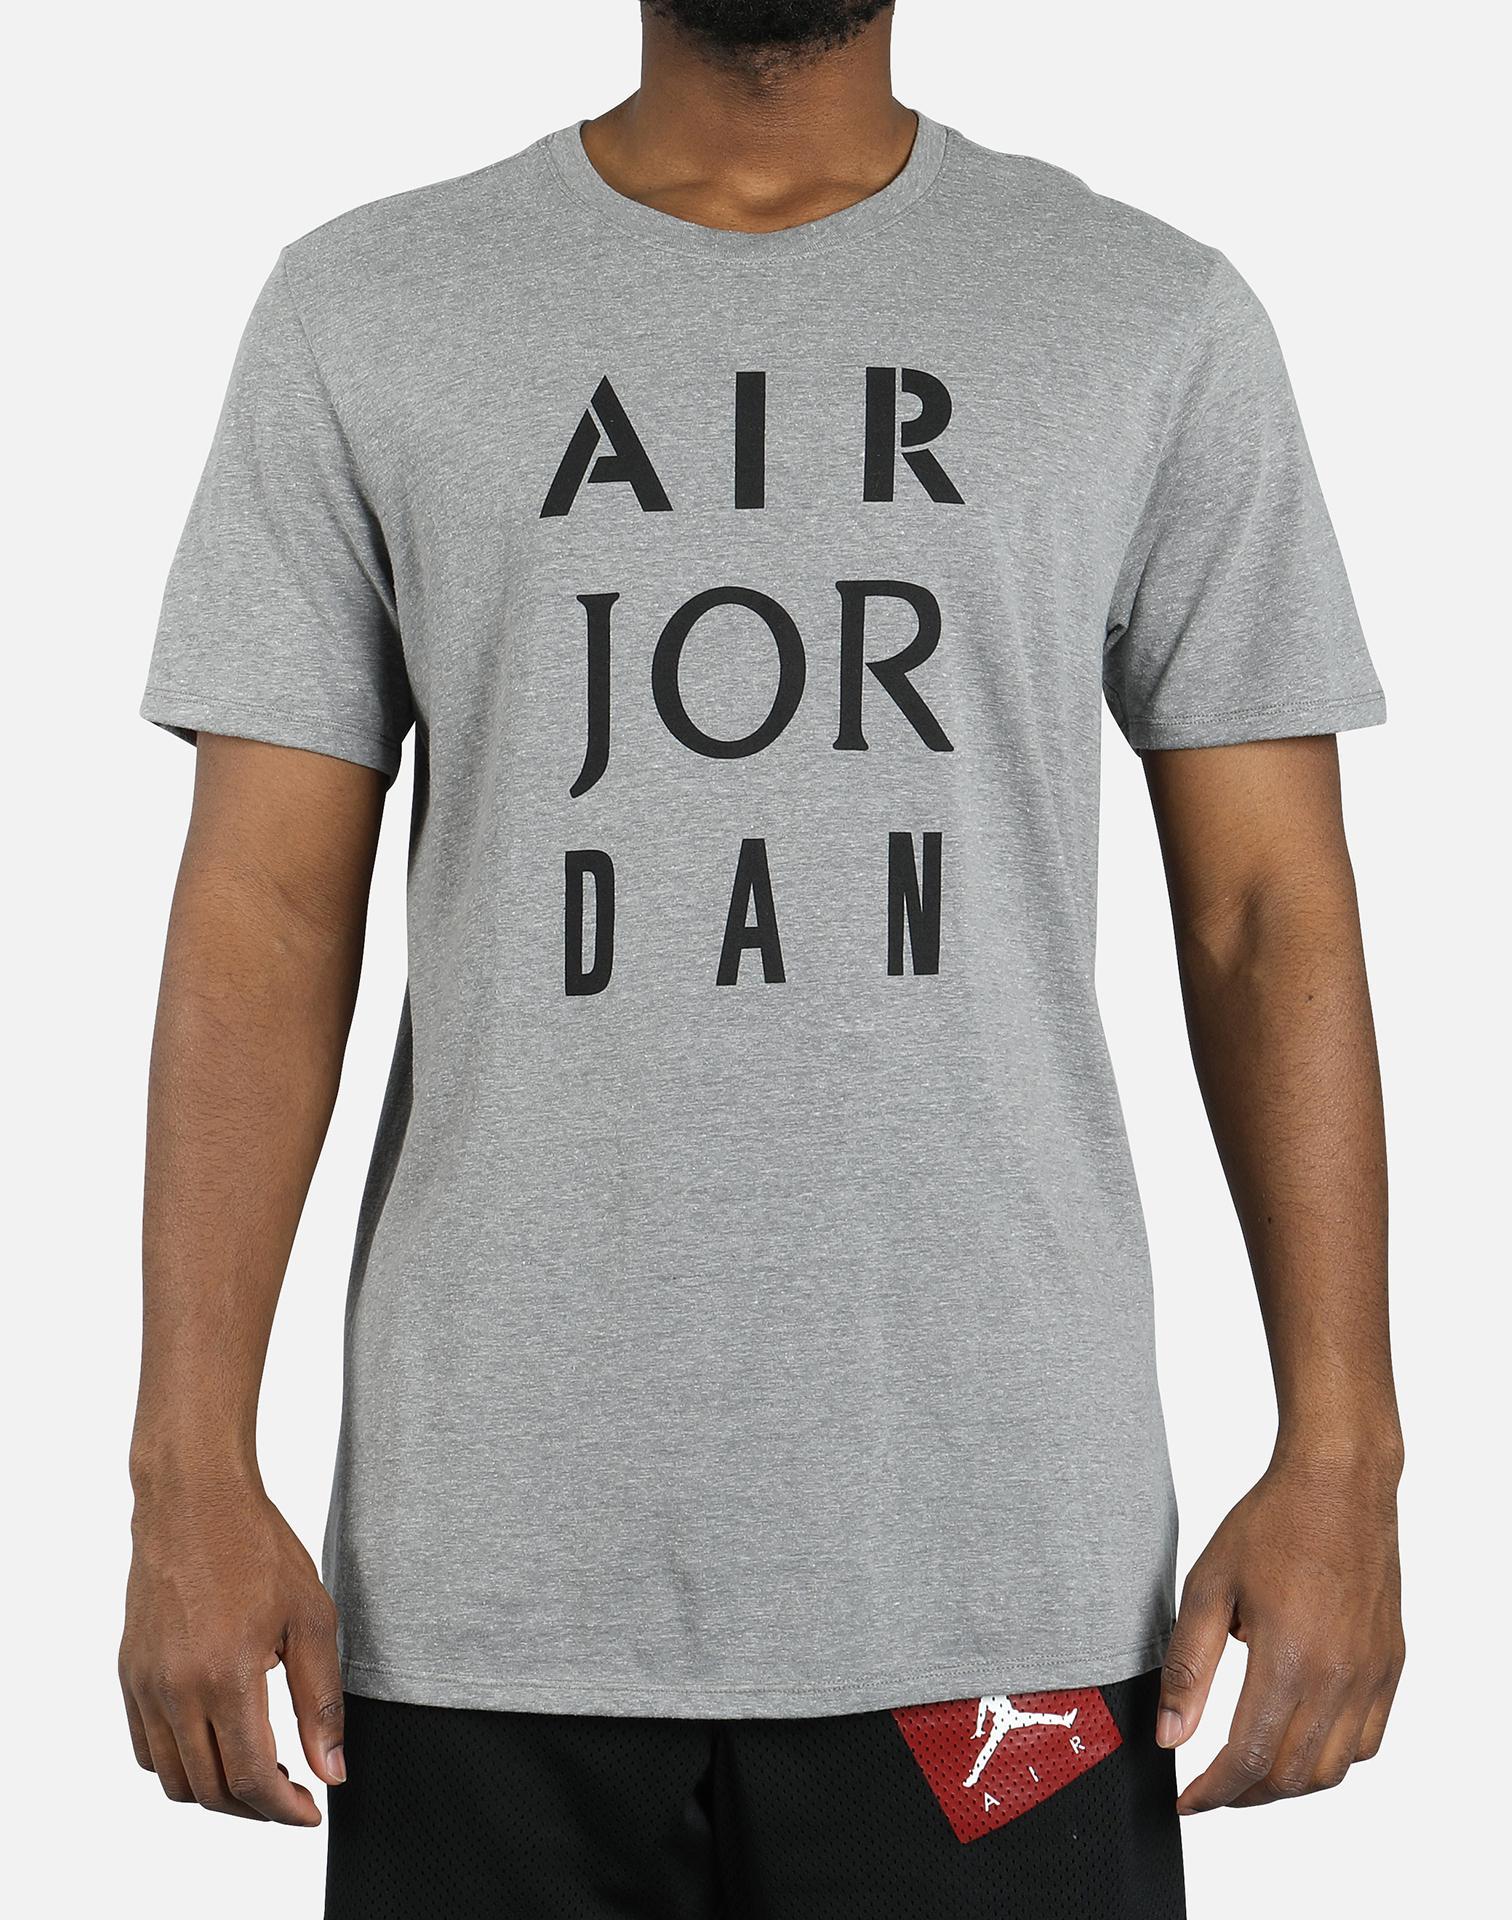 6b533e3dc9d20a Lyst - Nike Jsw Hbr Air Stencil Tee in Gray for Men